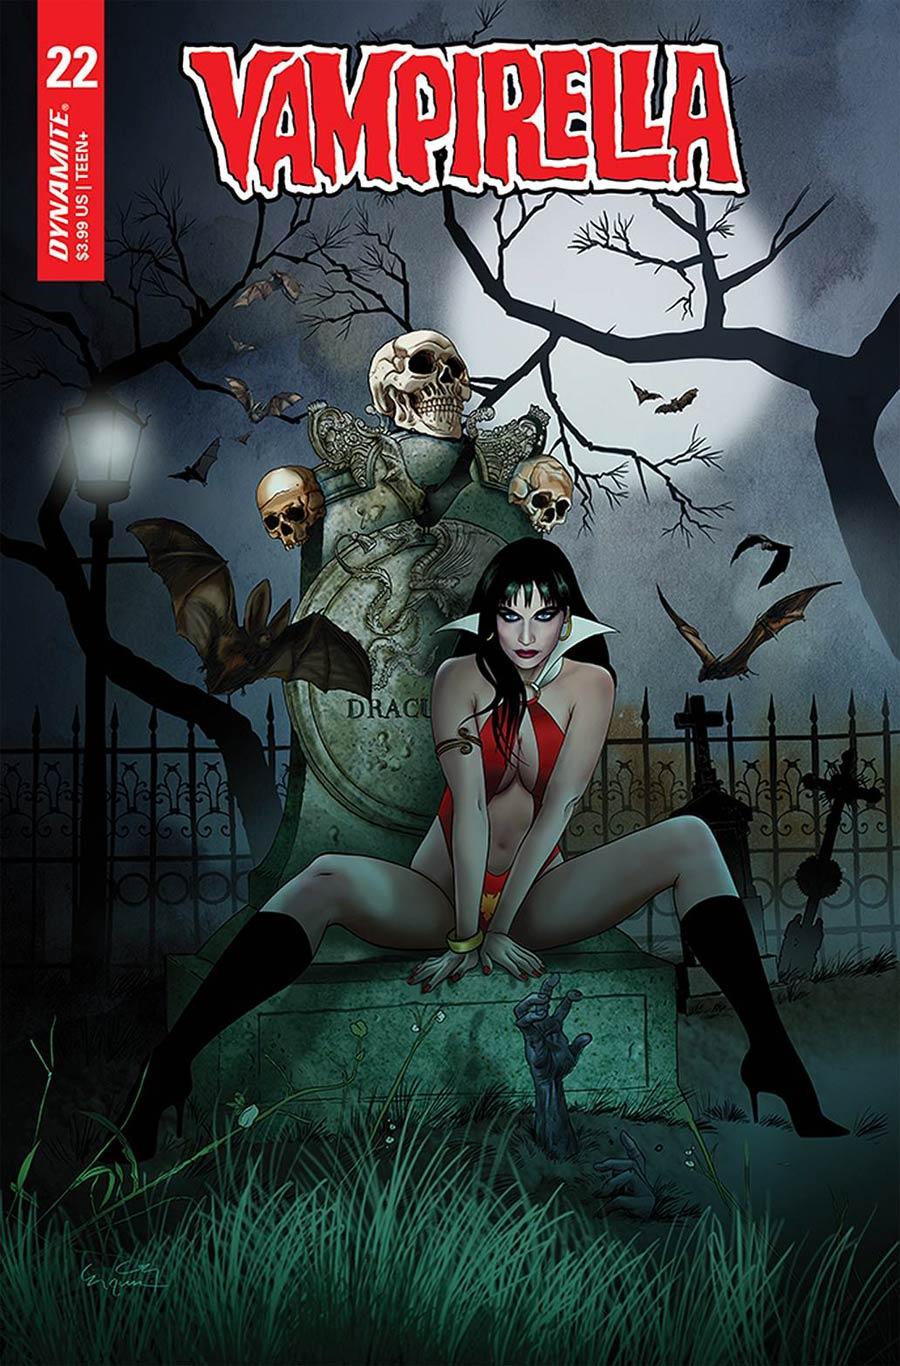 Vampirella Vol 8 #22 Cover D Variant Ergun Gunduz Cover